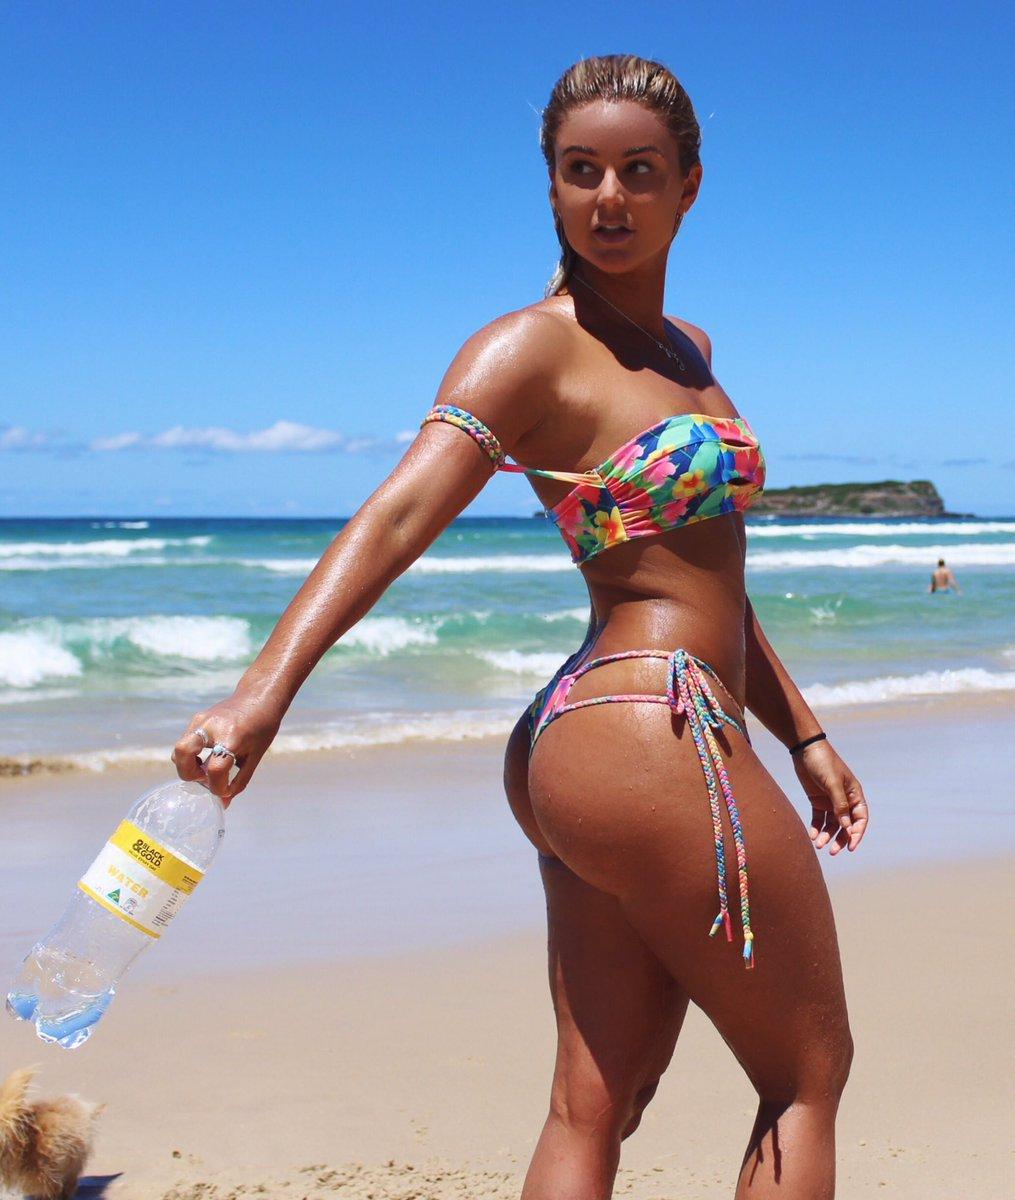 moana bikini discount code № 123089